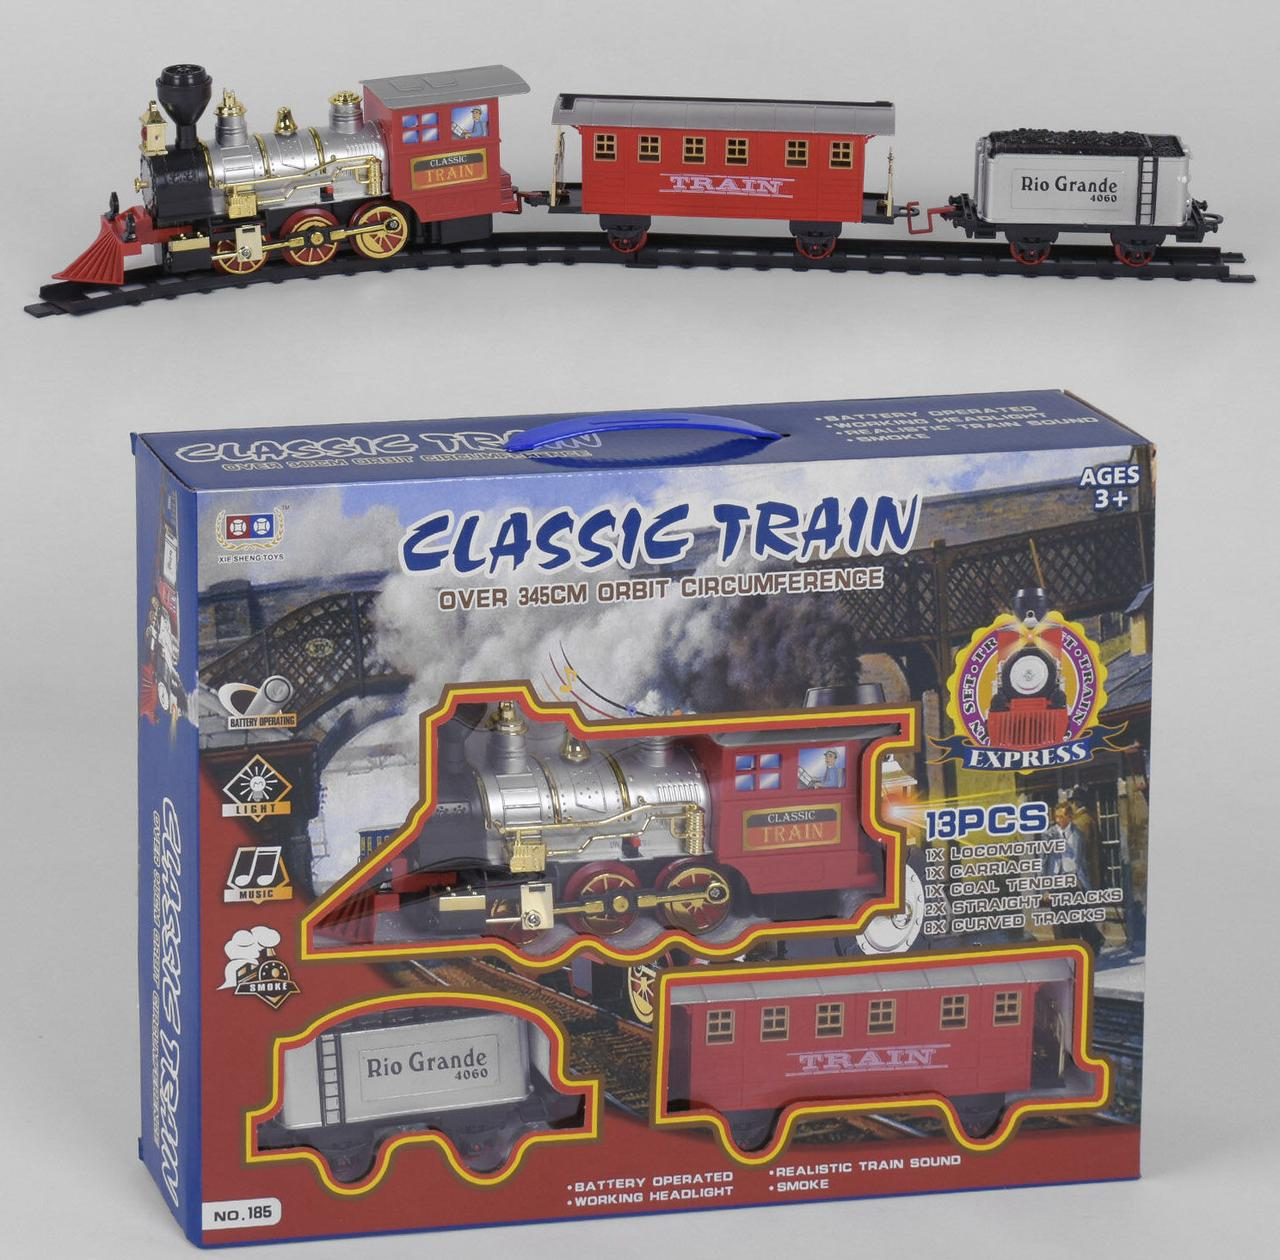 "Железная дорога ""Classic Train"" в коробке 185"